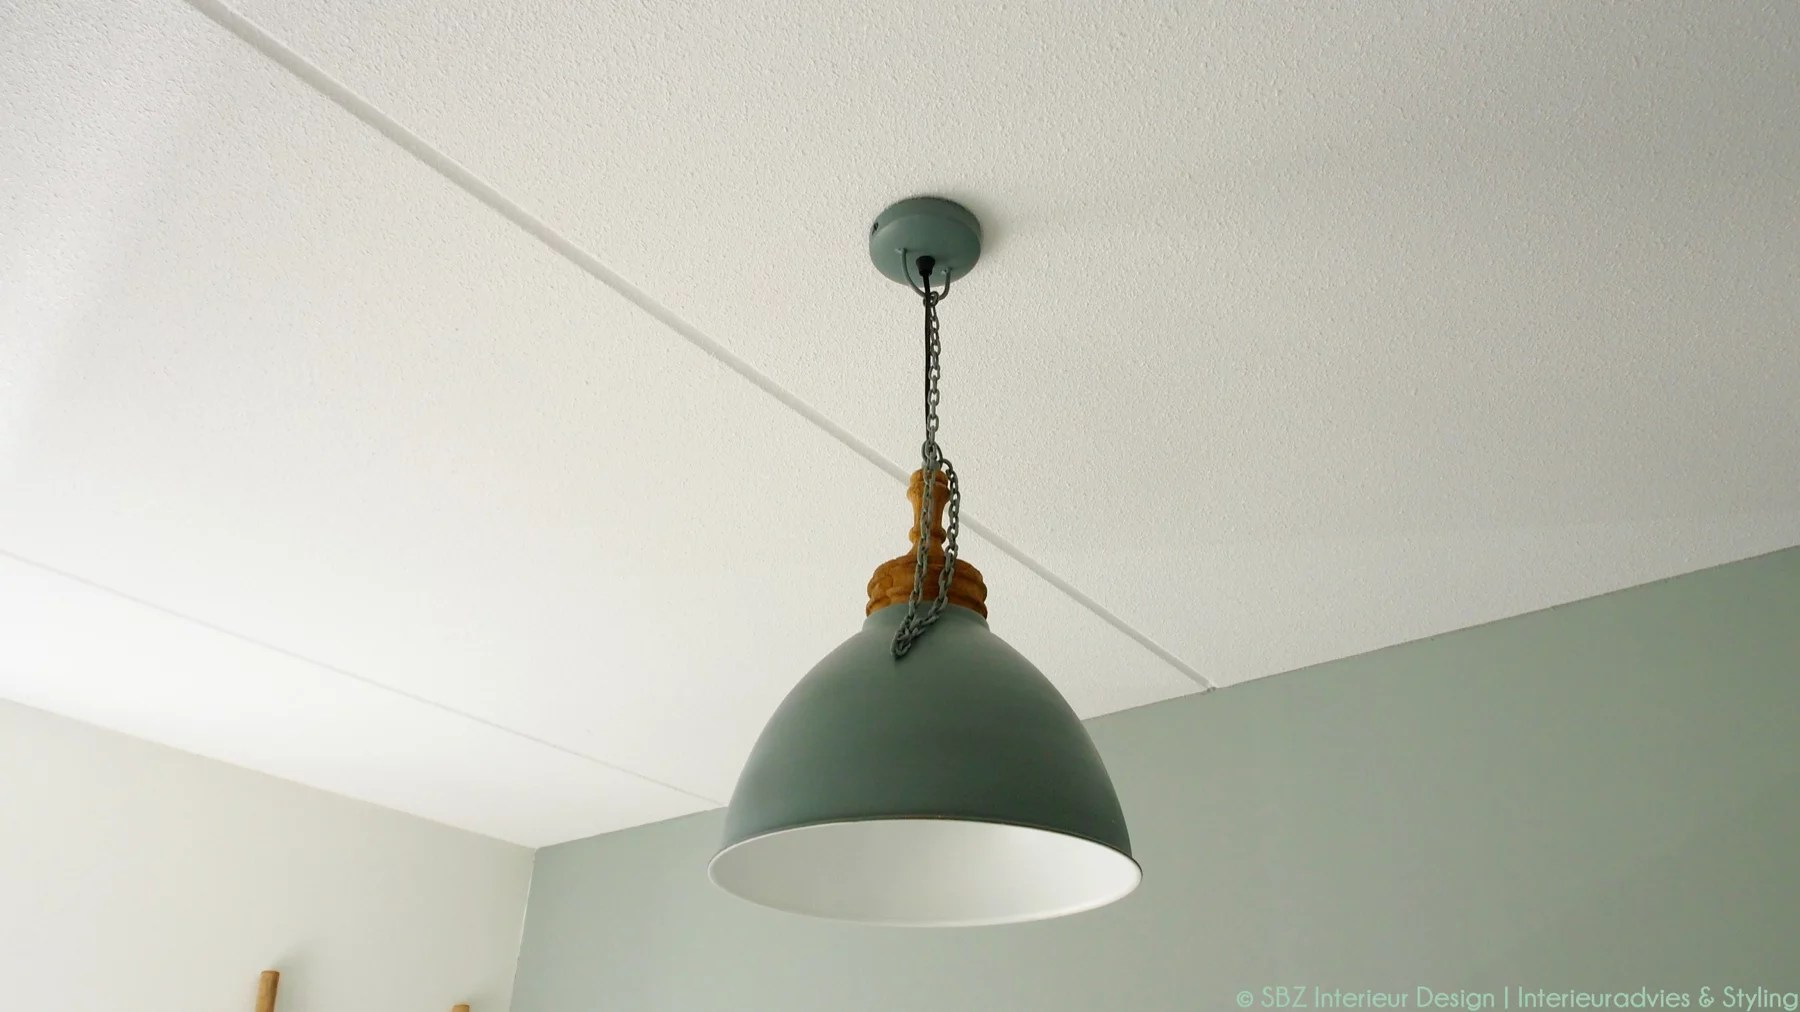 Lamp Kinderkamer Wit : Leeslamp kinderkamer perfect stoere leger lamp leger